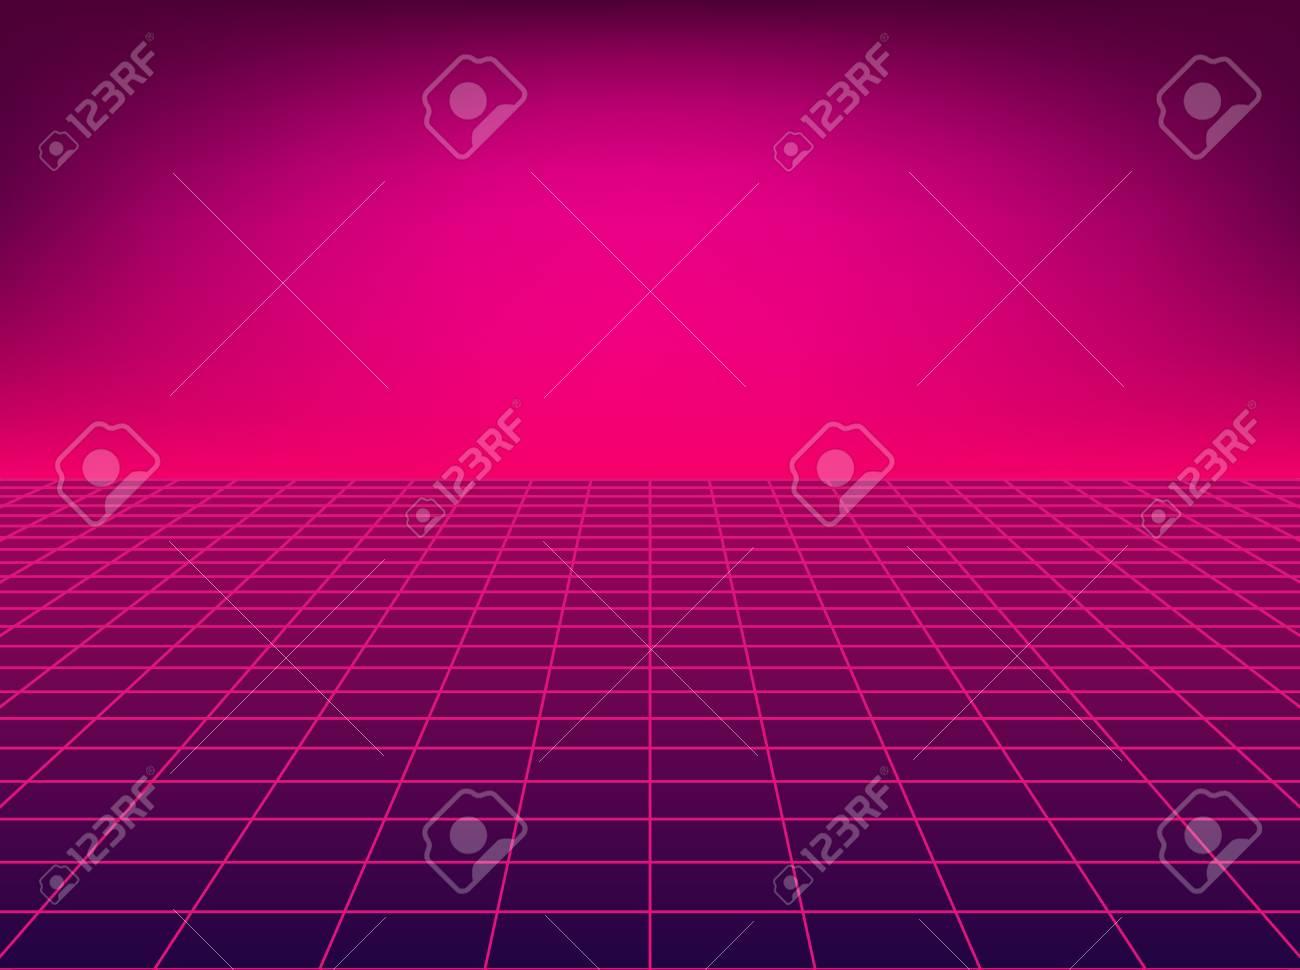 Neon perspective grid. Retro floor background in 80s style. - 114438273